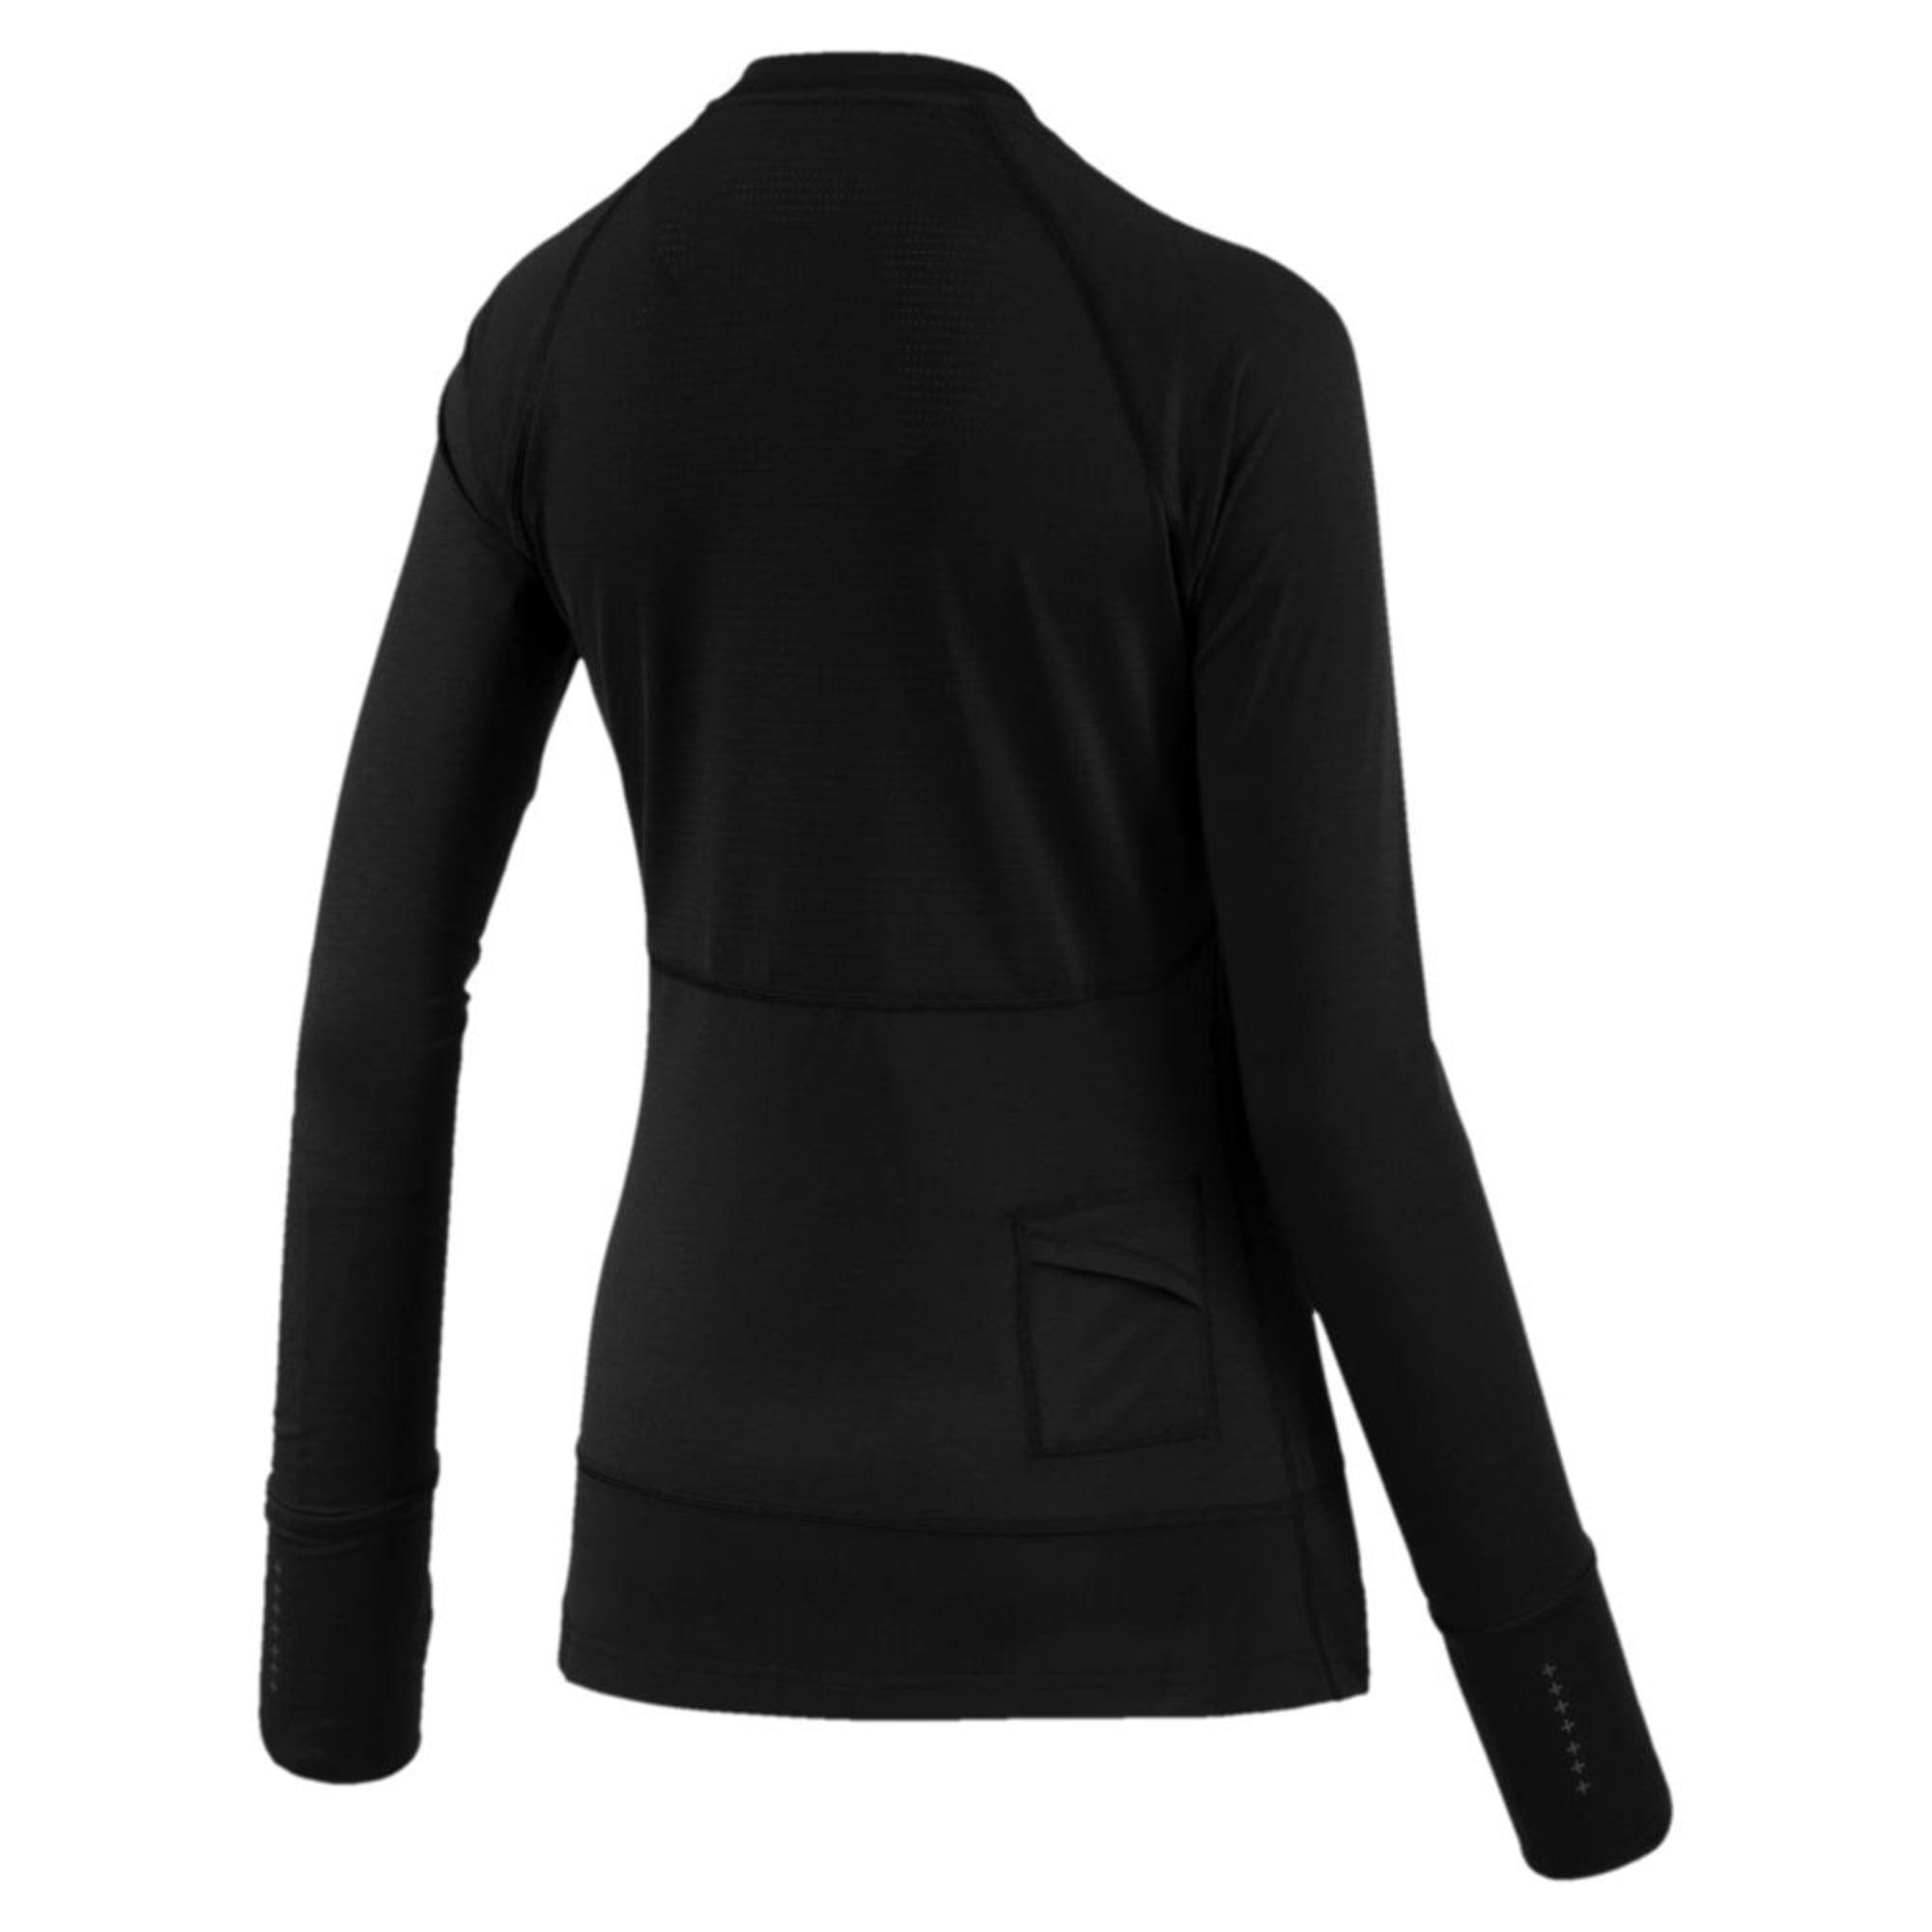 Thumbnail 2 of Winter Long Sleeve Women's Training Top, Puma Black, medium-IND